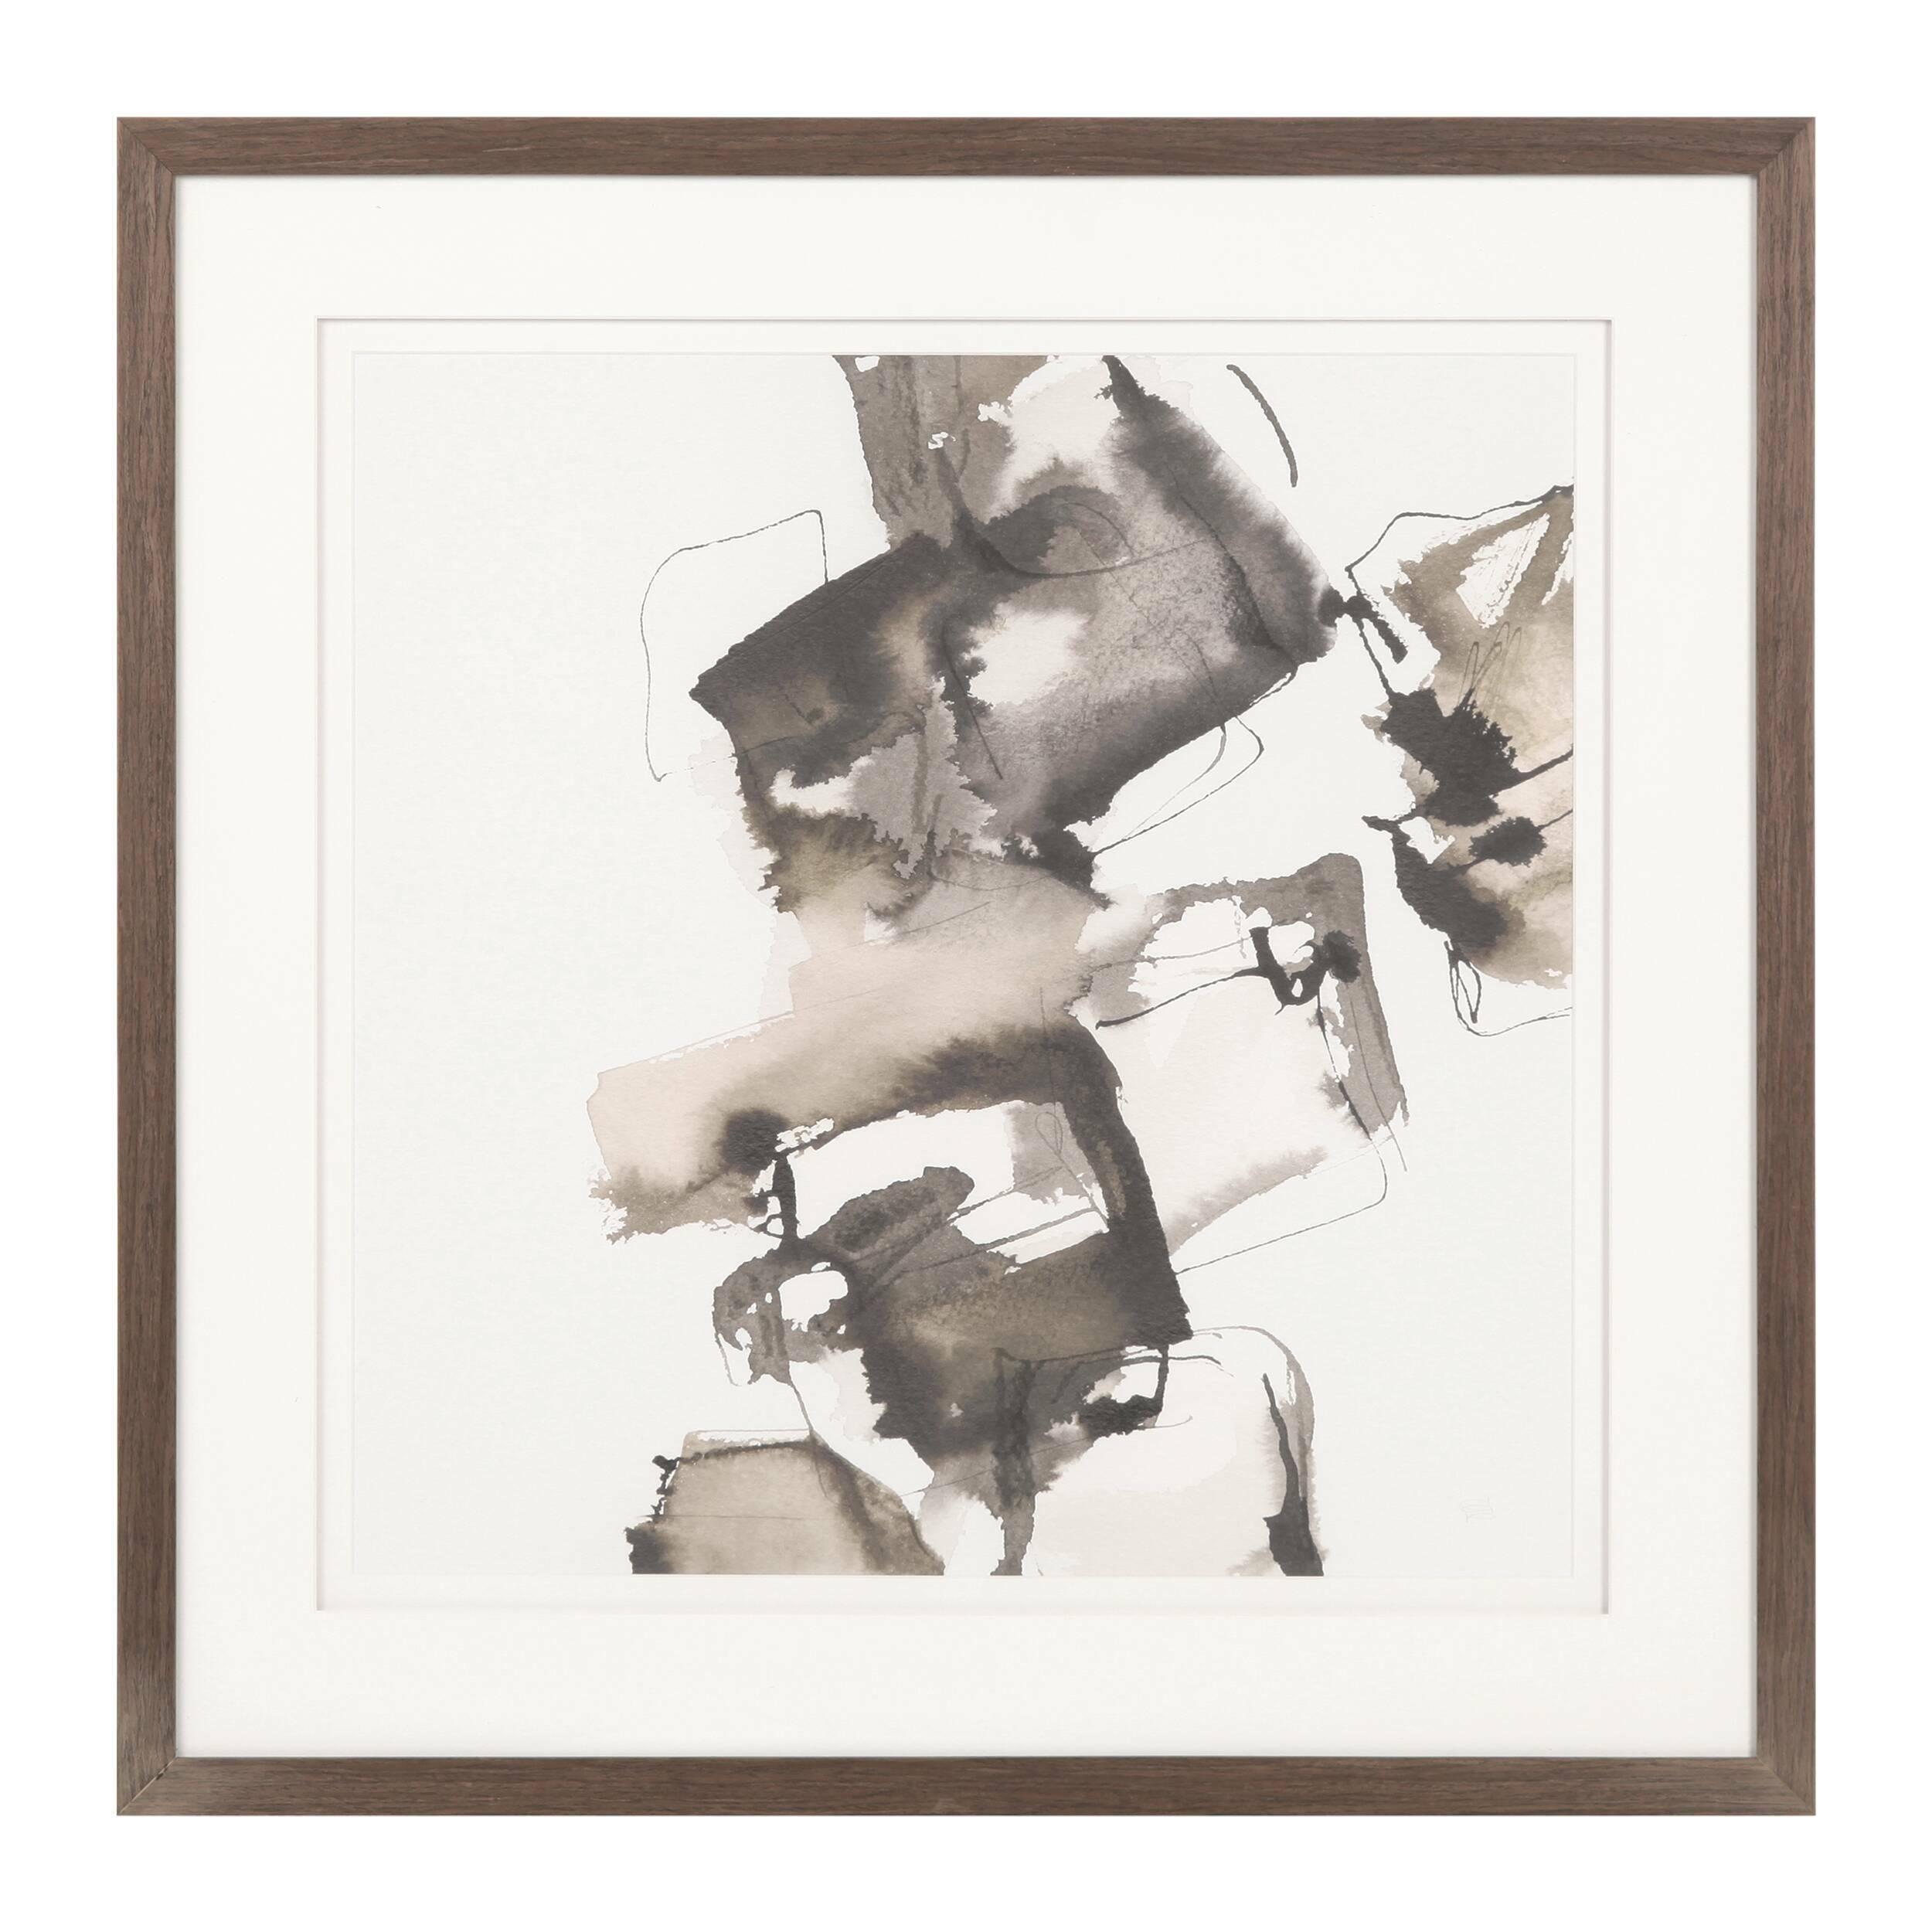 Постер Abstraction 1Картины<br><br><br>stock: 3<br>Ширина: 81,4<br>Цвет: Разноцветный<br>Длина: 81,4